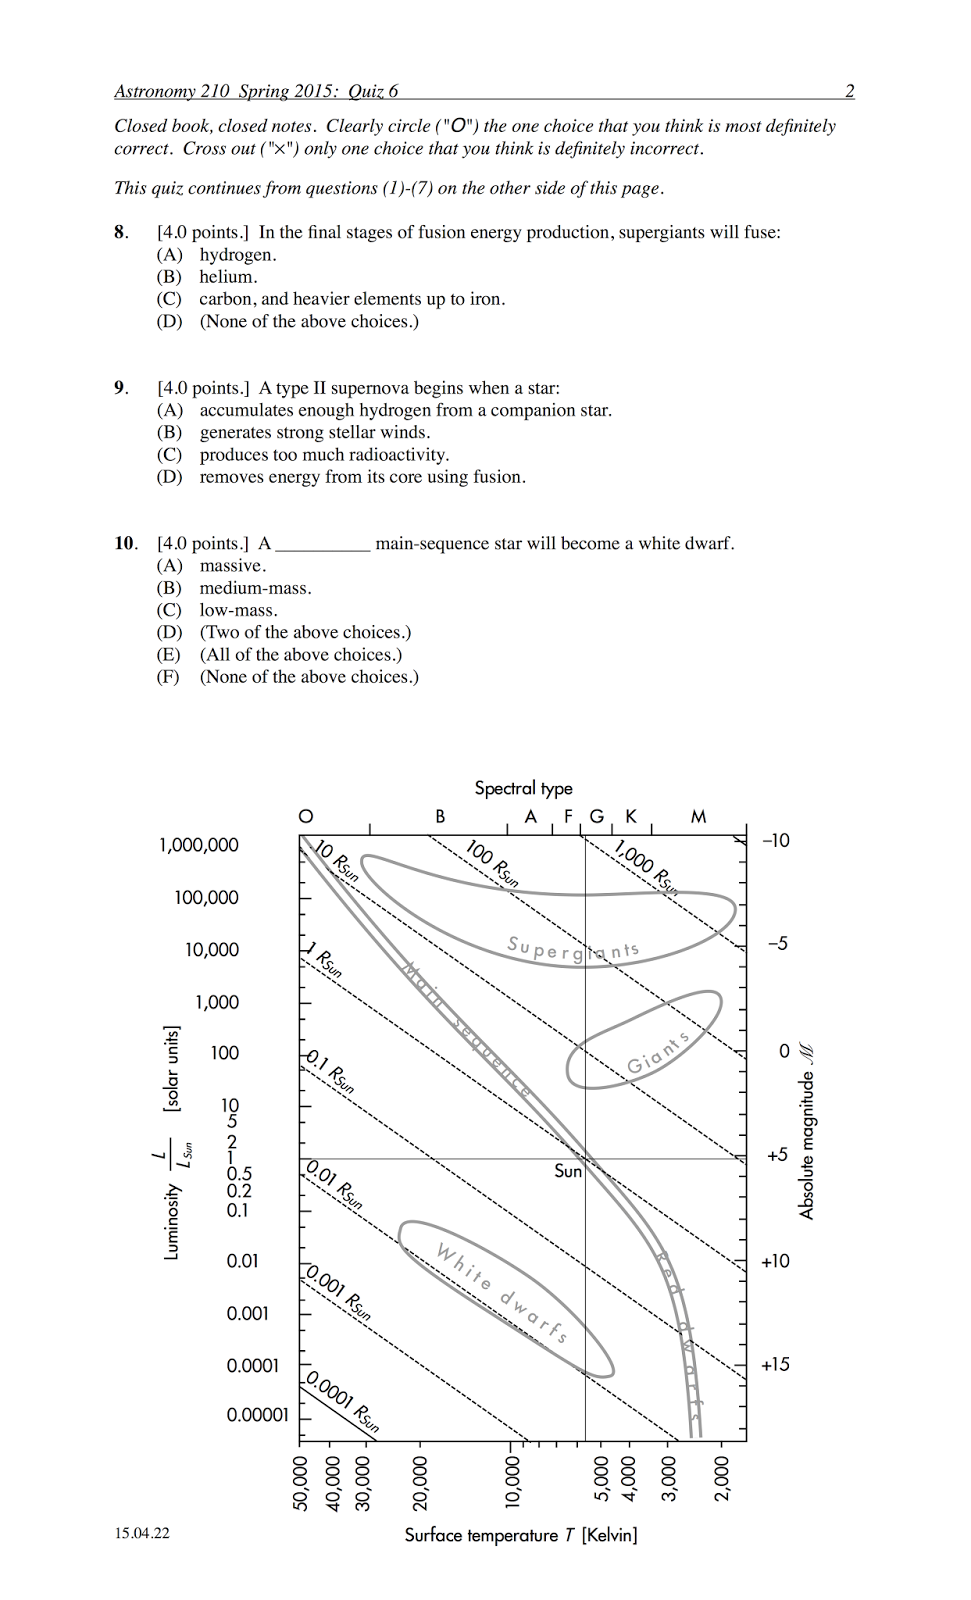 Wegener and Continental Drift Theory